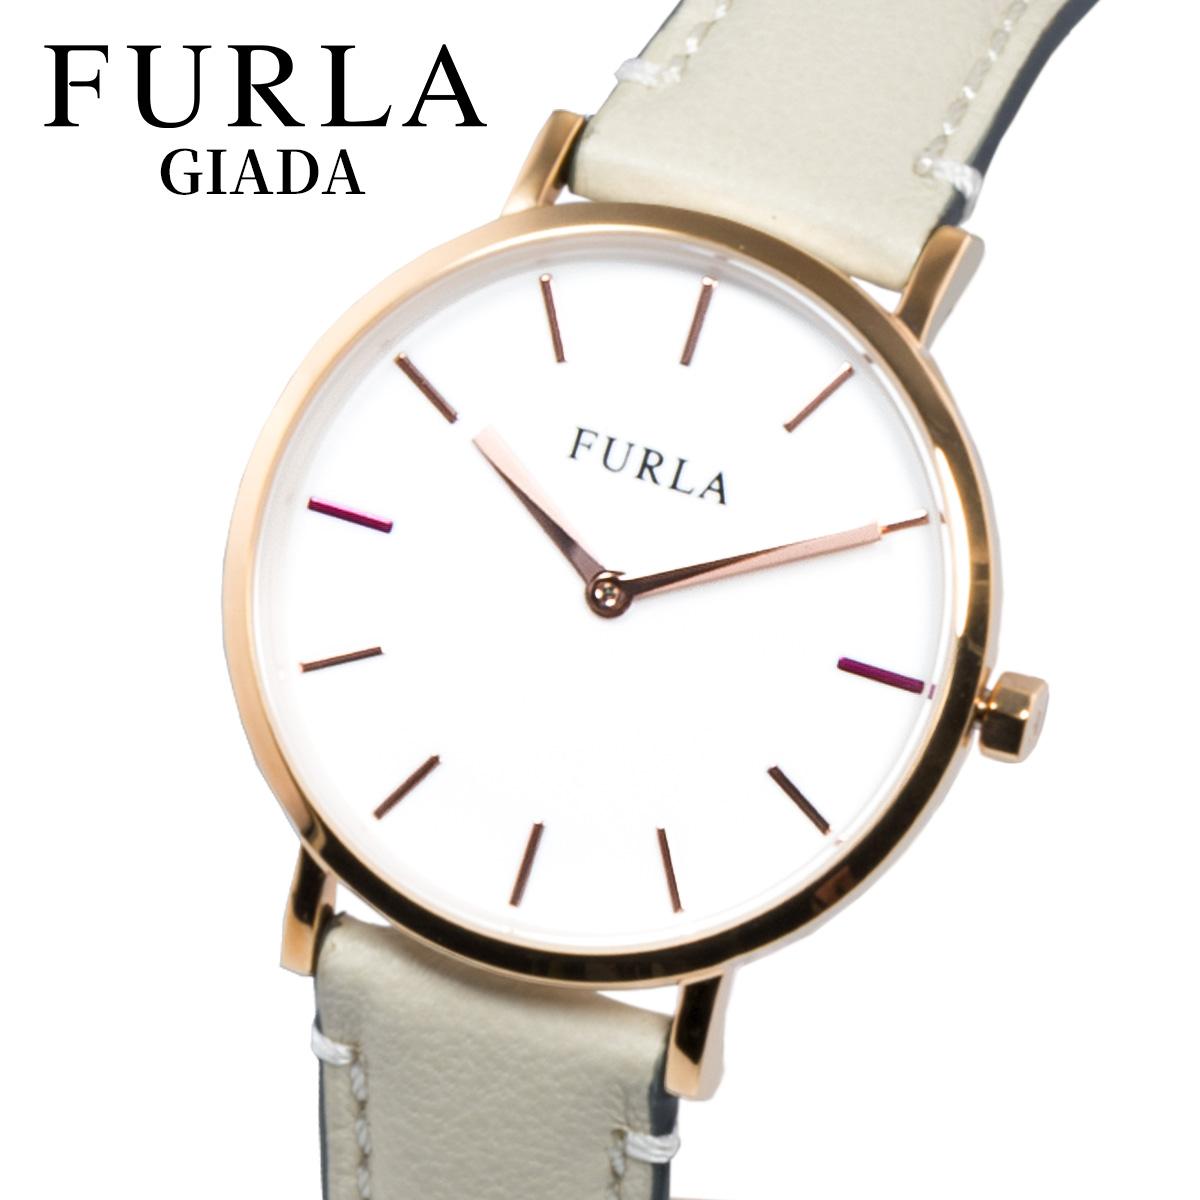 523e135568cb フルラ 海外正規品 送料無料 あす楽フルラ FURLA ジャーダ GIADA R4251108503 レディース 時計 腕時計 クオーツ